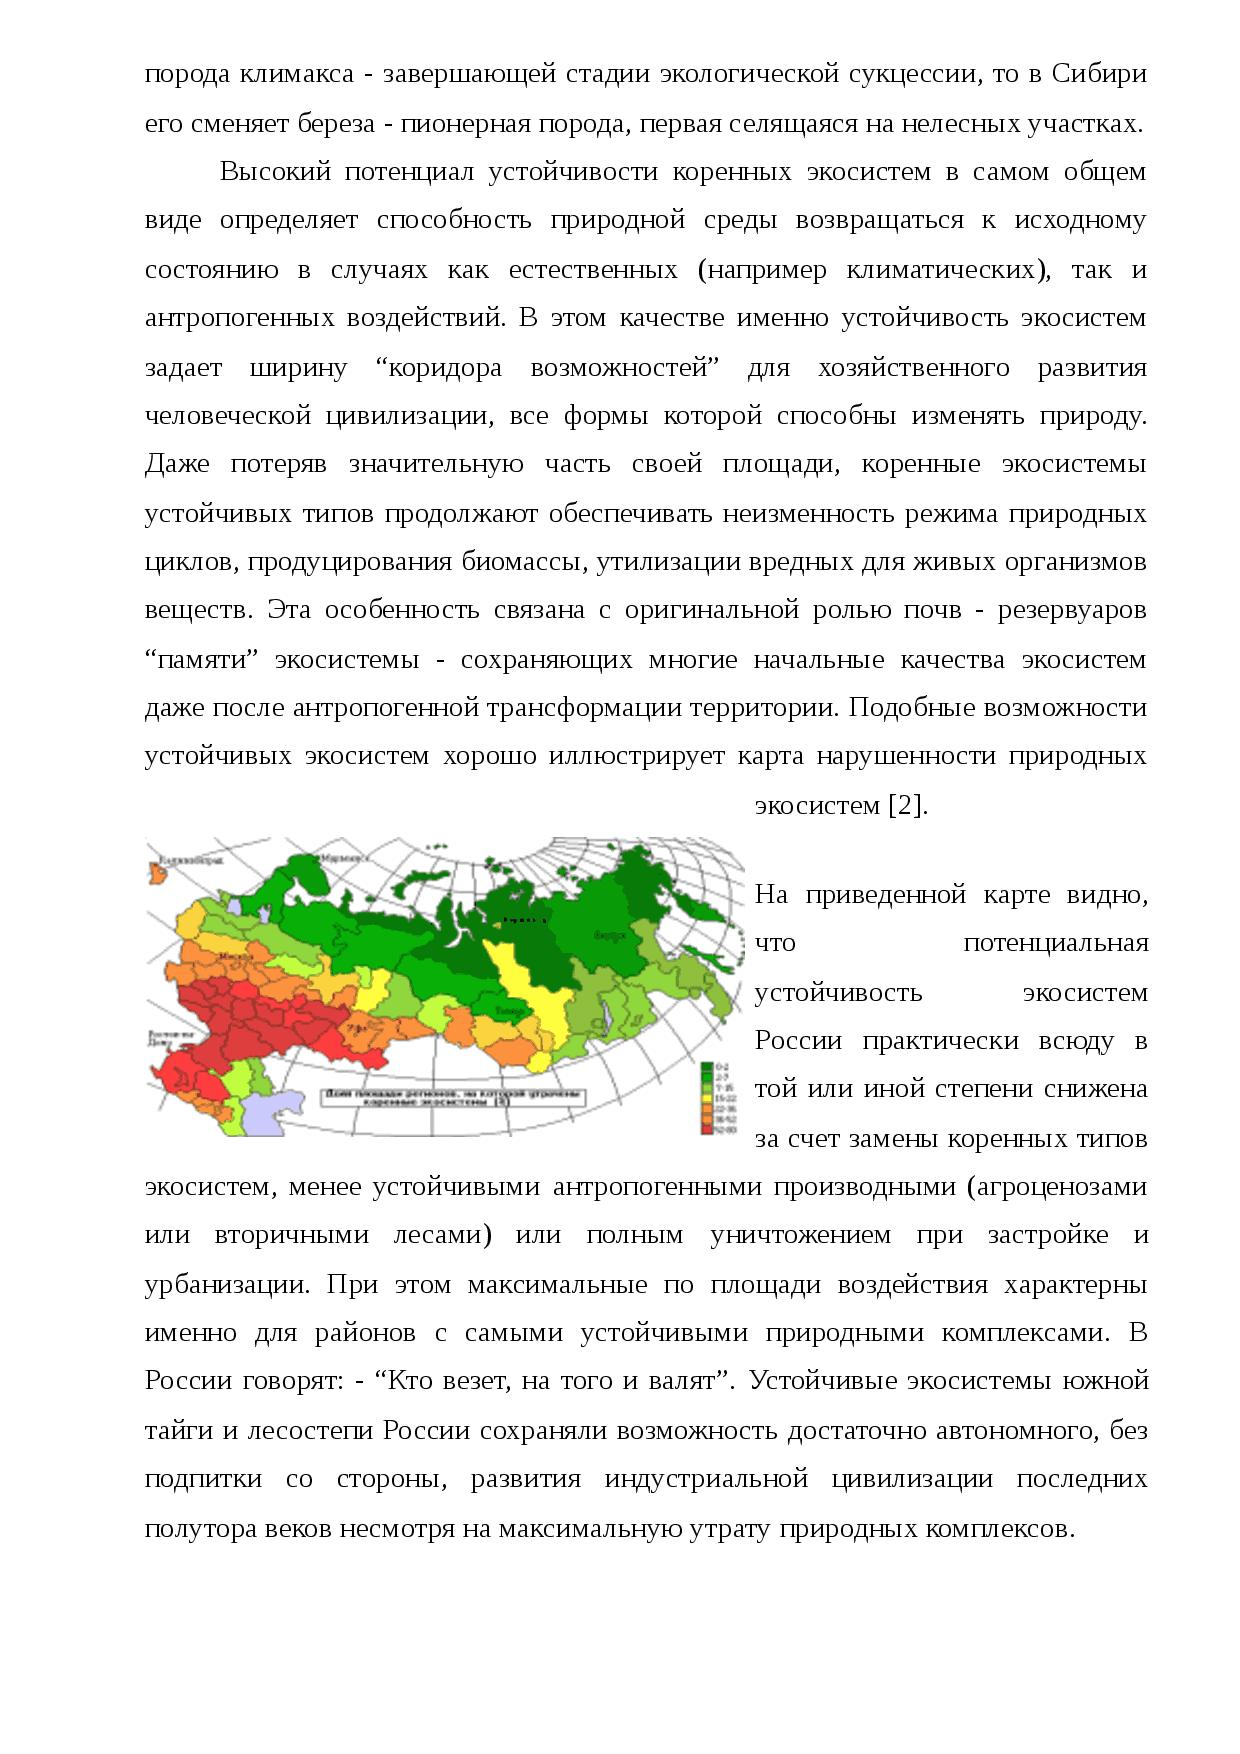 Экосистема - ecosystem - qwe.wiki